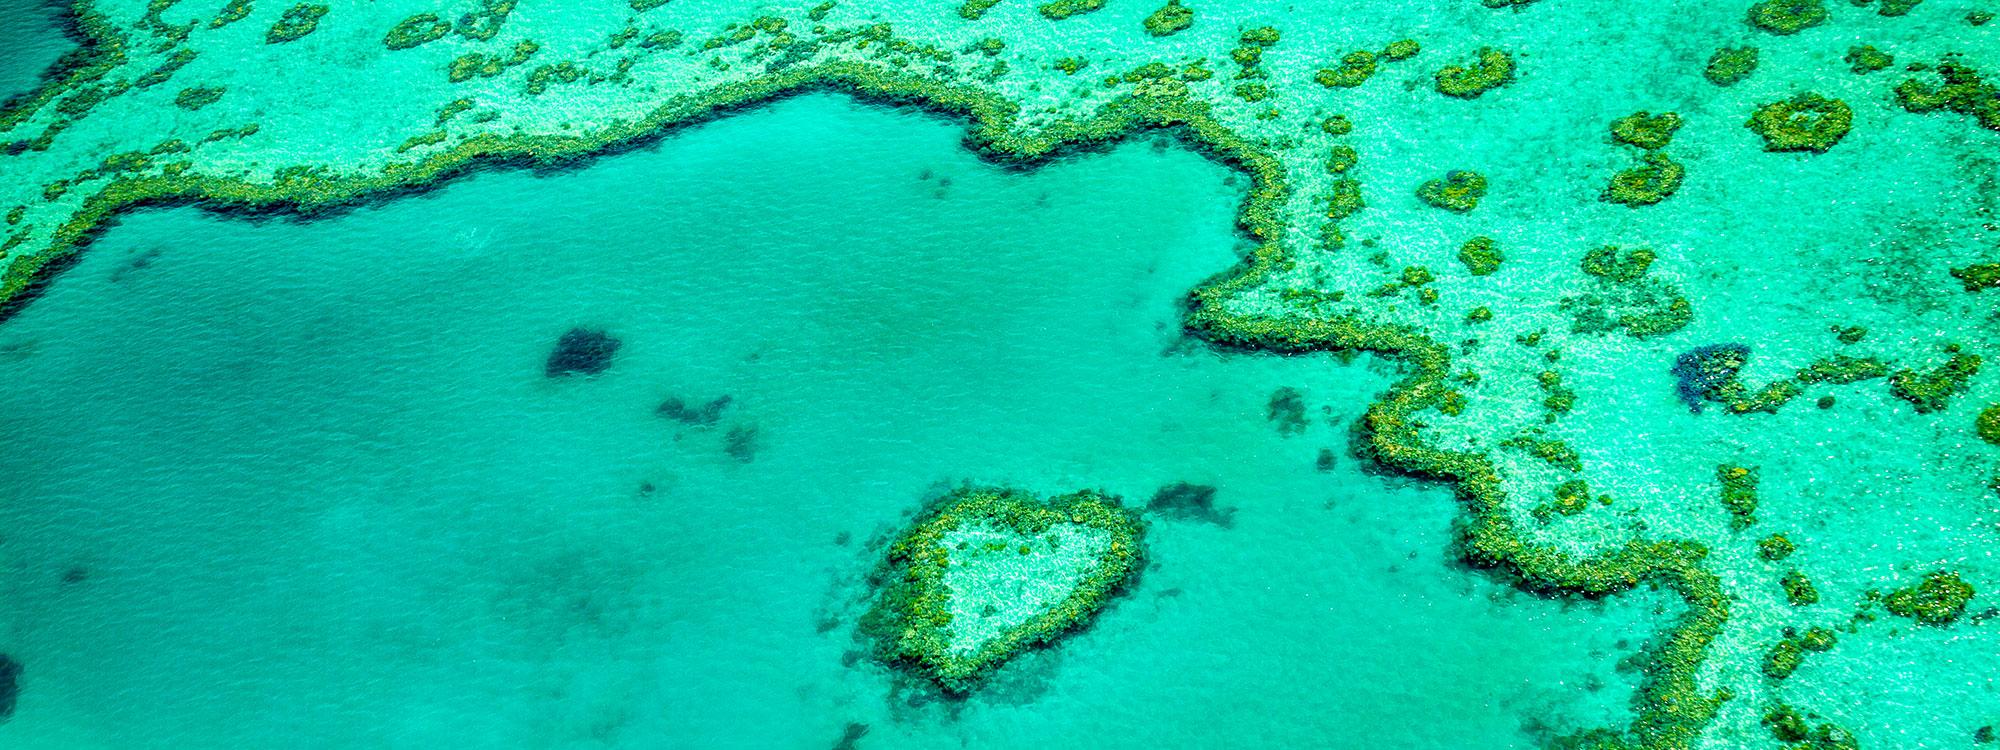 1301190115.jpg-heart-reef-banner-2000